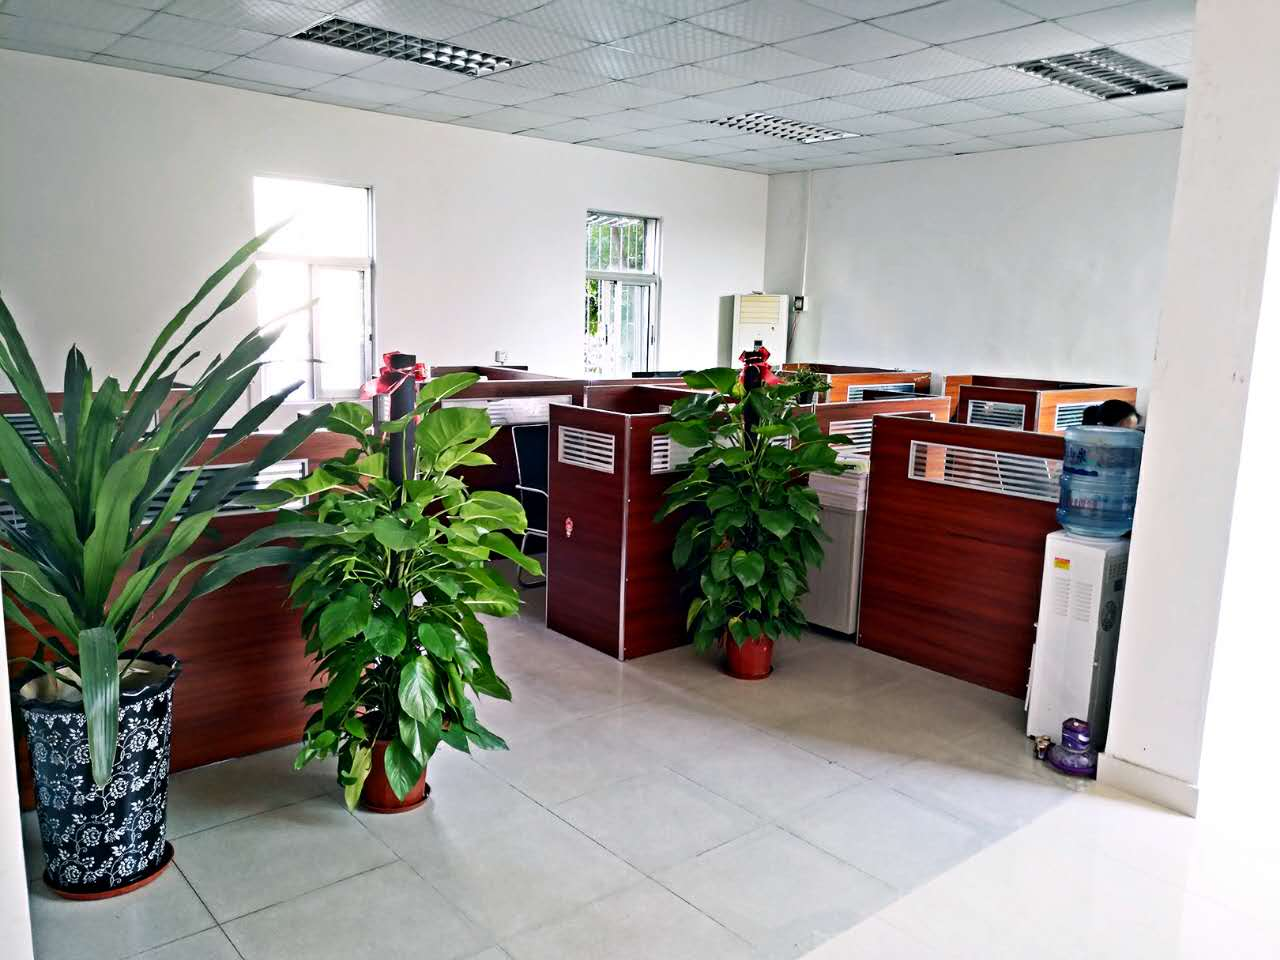 Shenzhen Heilifes Technology Co., Ltd